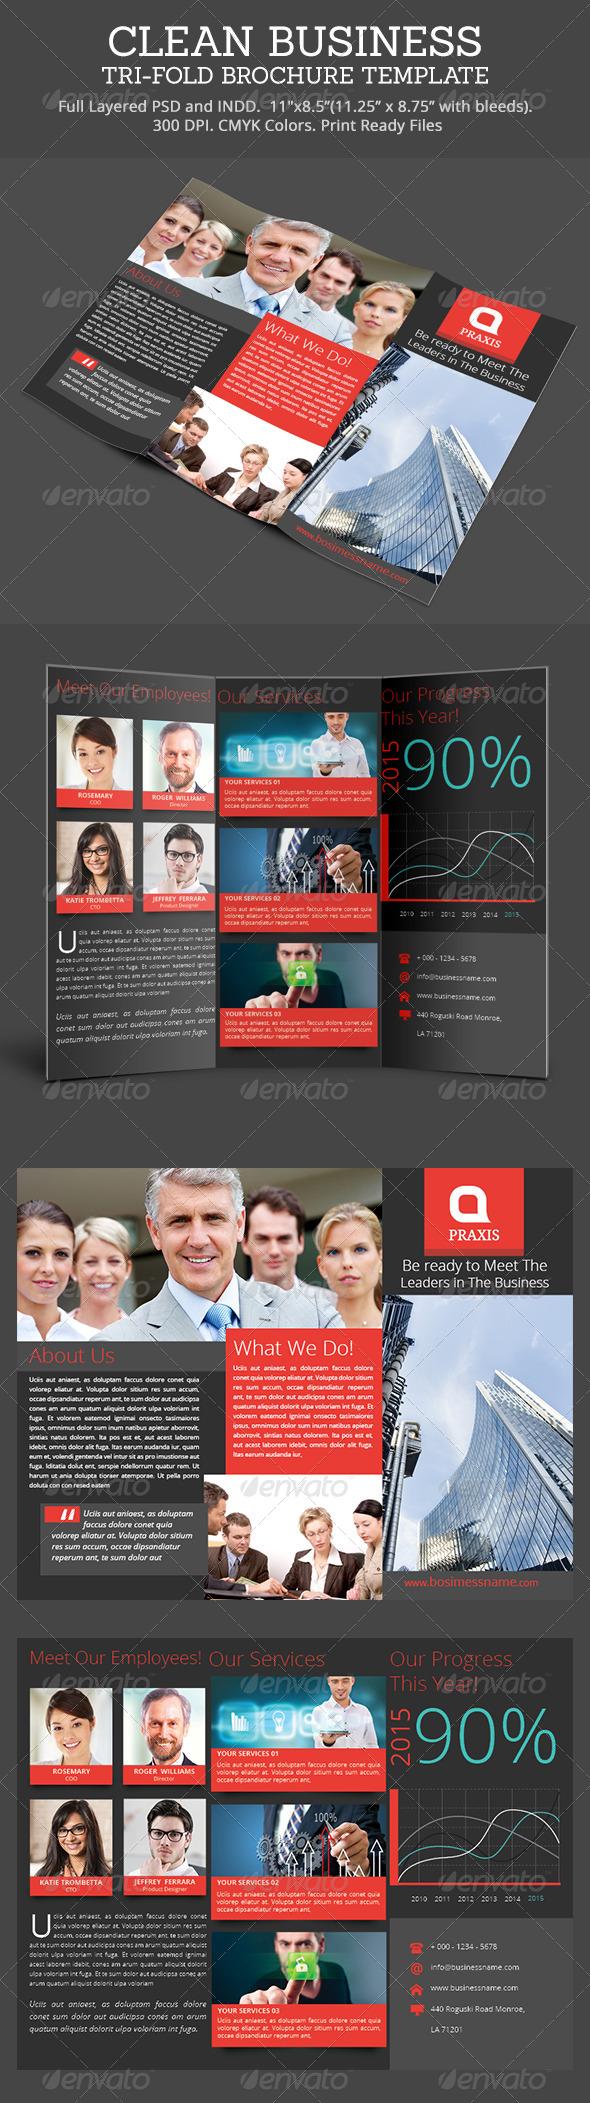 GraphicRiver Clean Business Tri-Fold Brochure 7764475